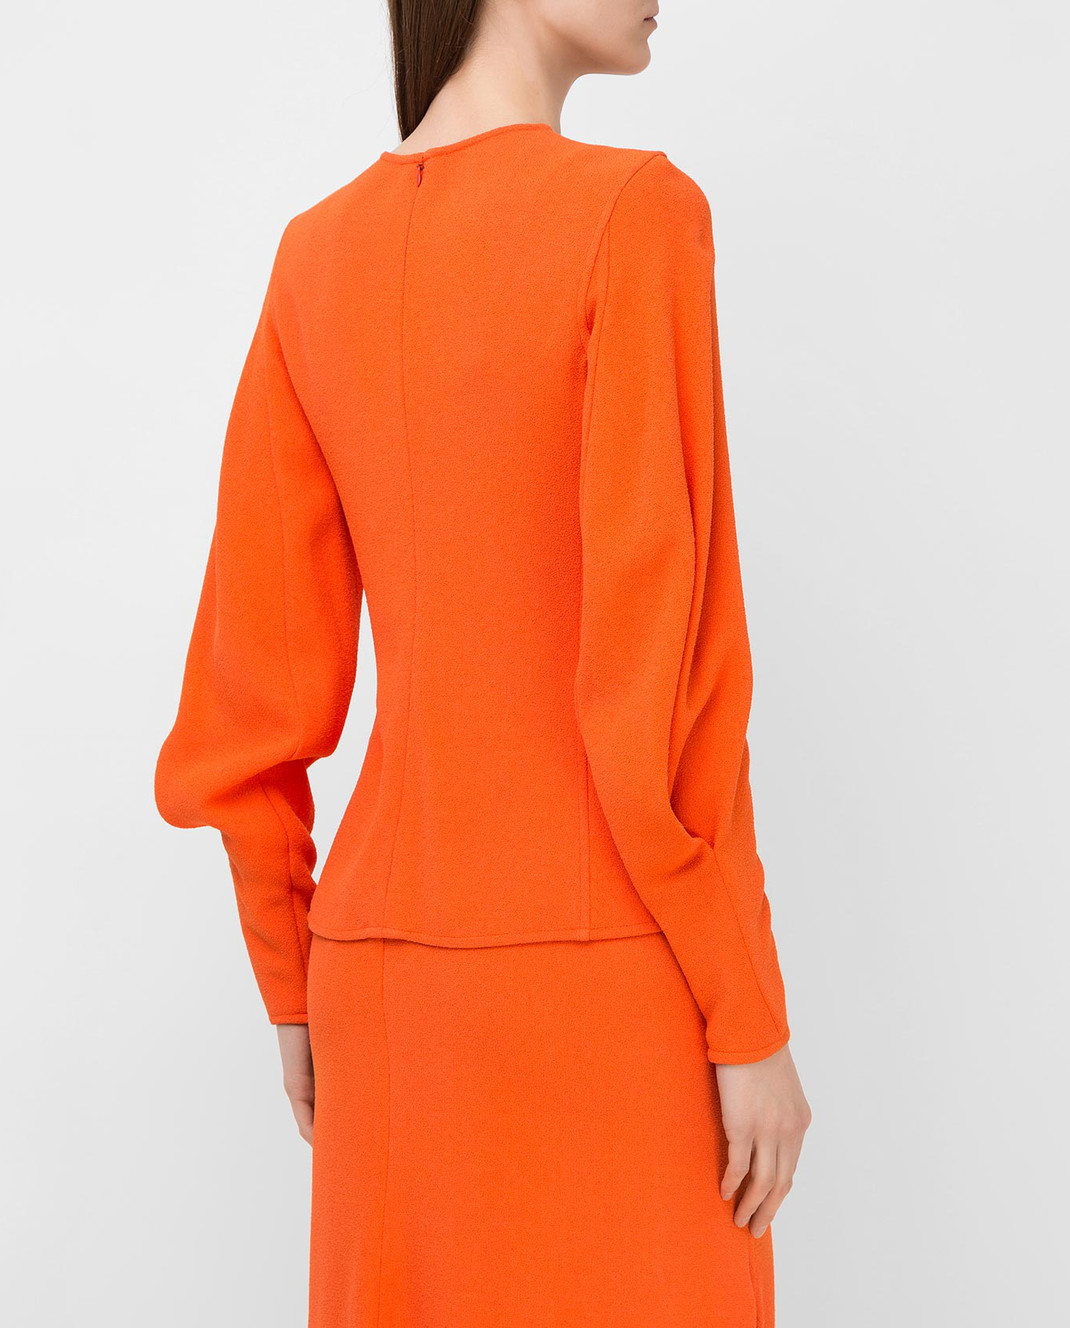 Victoria Beckham Оранжевая блуза TPLNG1339 изображение 4